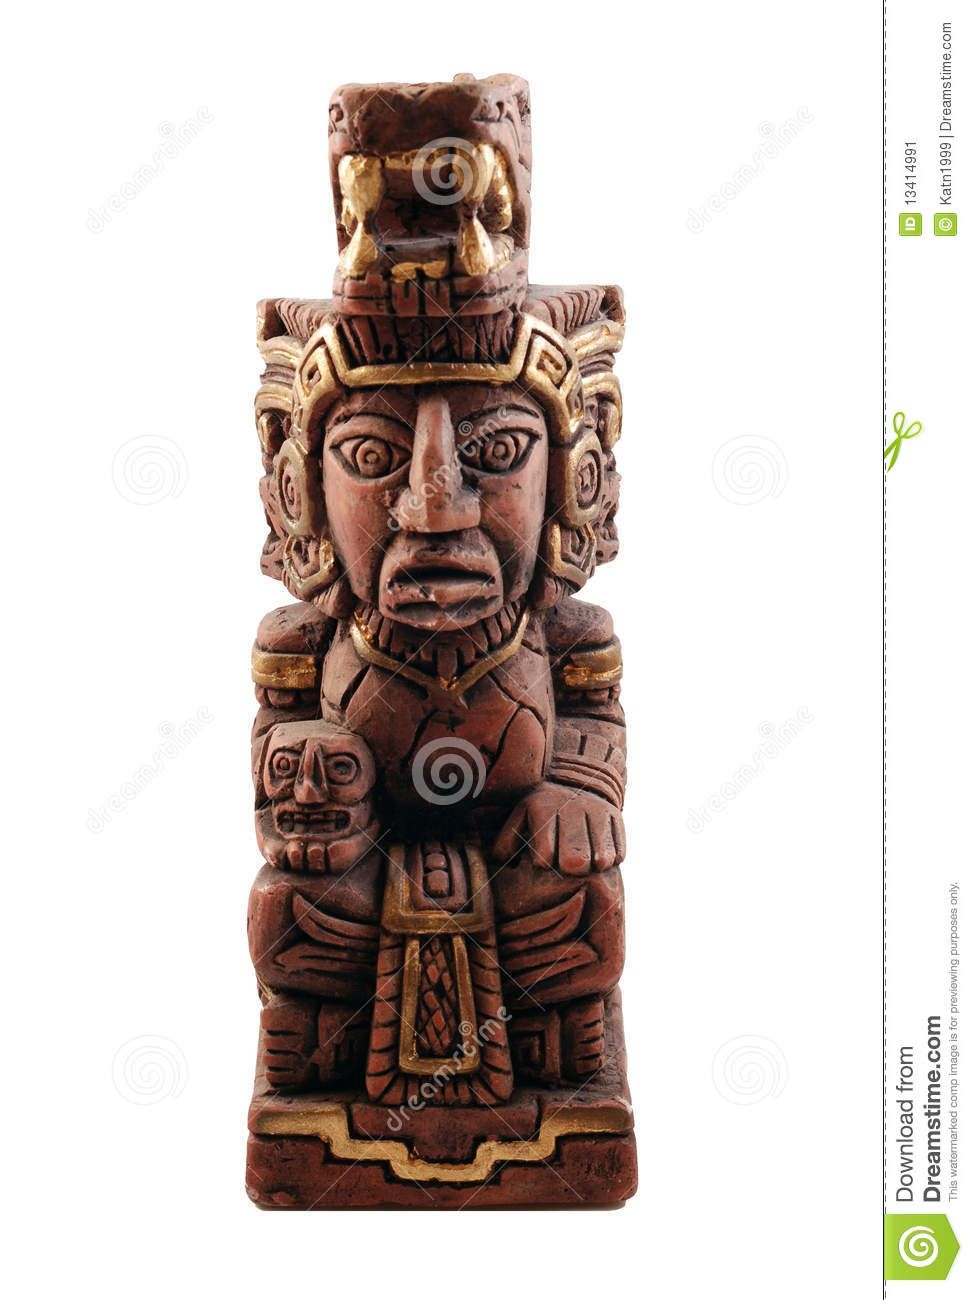 mayan-statue-mexico-13414991.jpg (973×1300)